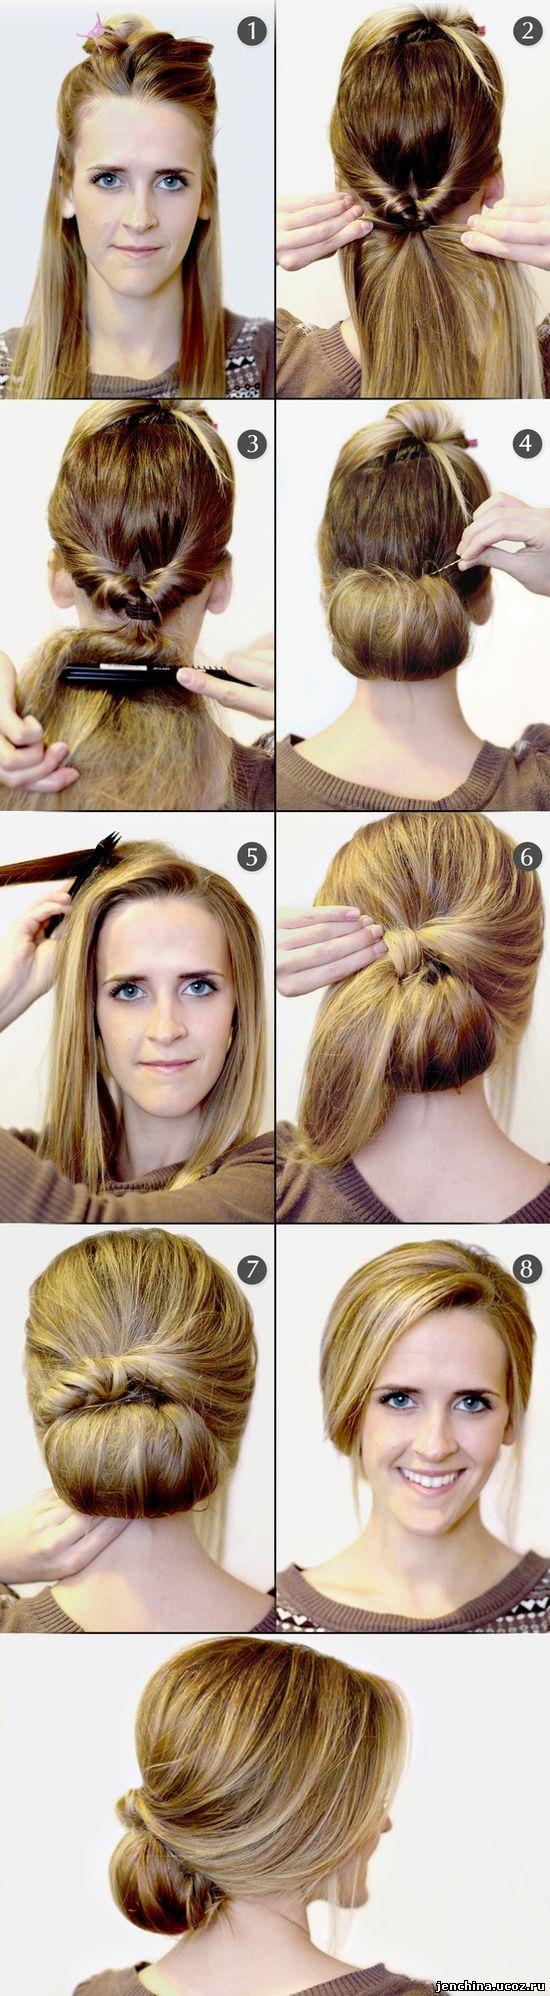 Причёски для средних волос своими руками в домашних условиях фото